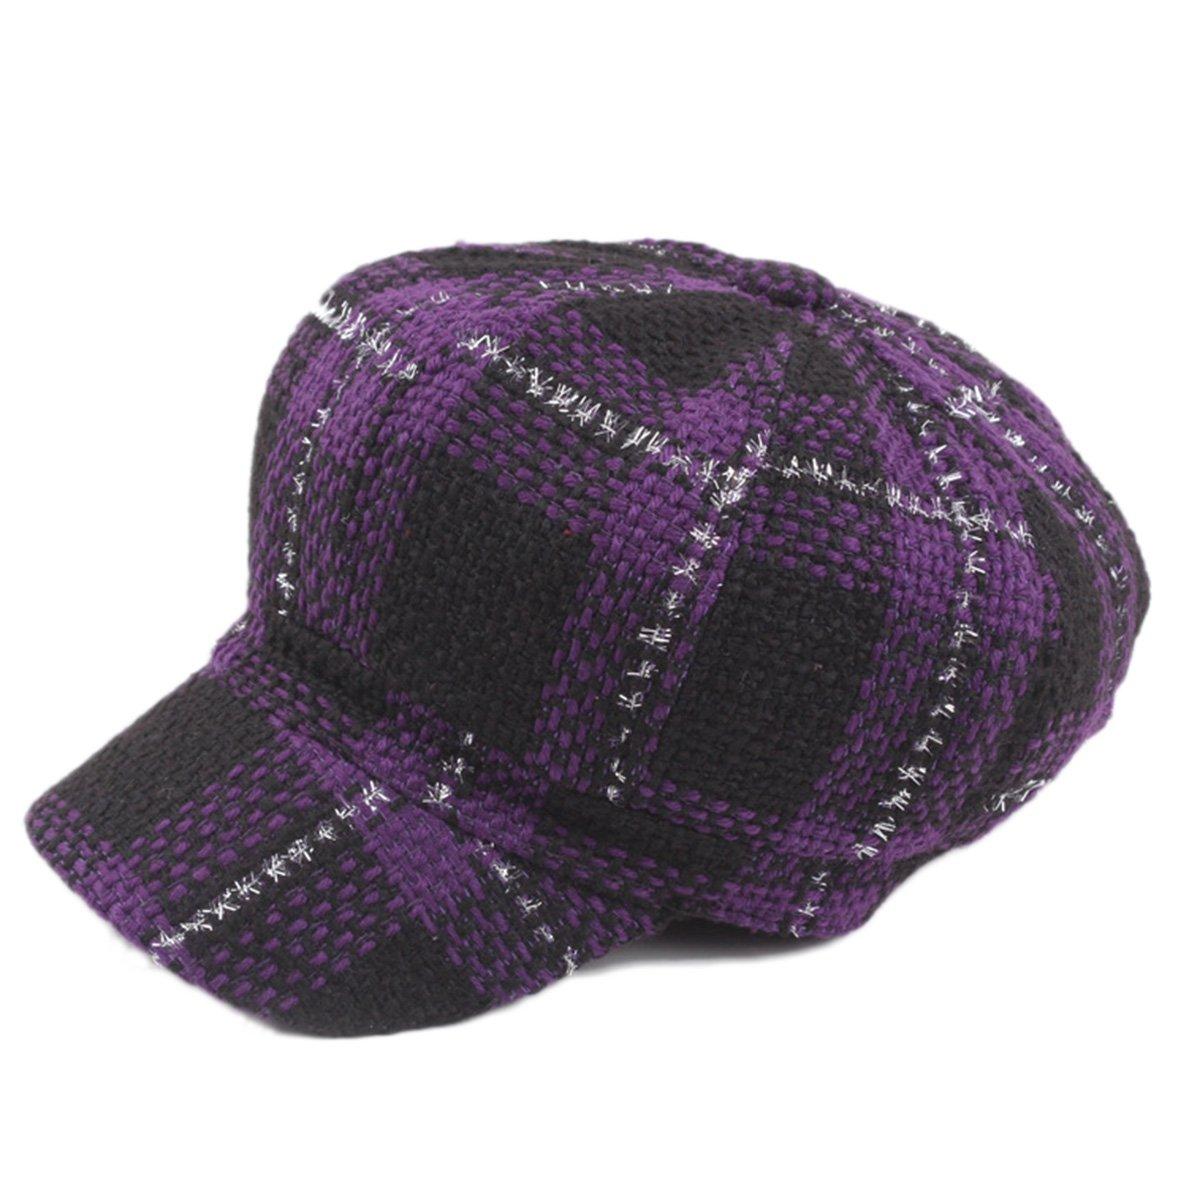 ZLSLZ Womens Knitting Plaid IVY newsboy Cabbie Gatsby Paperboy Painter Hats Caps